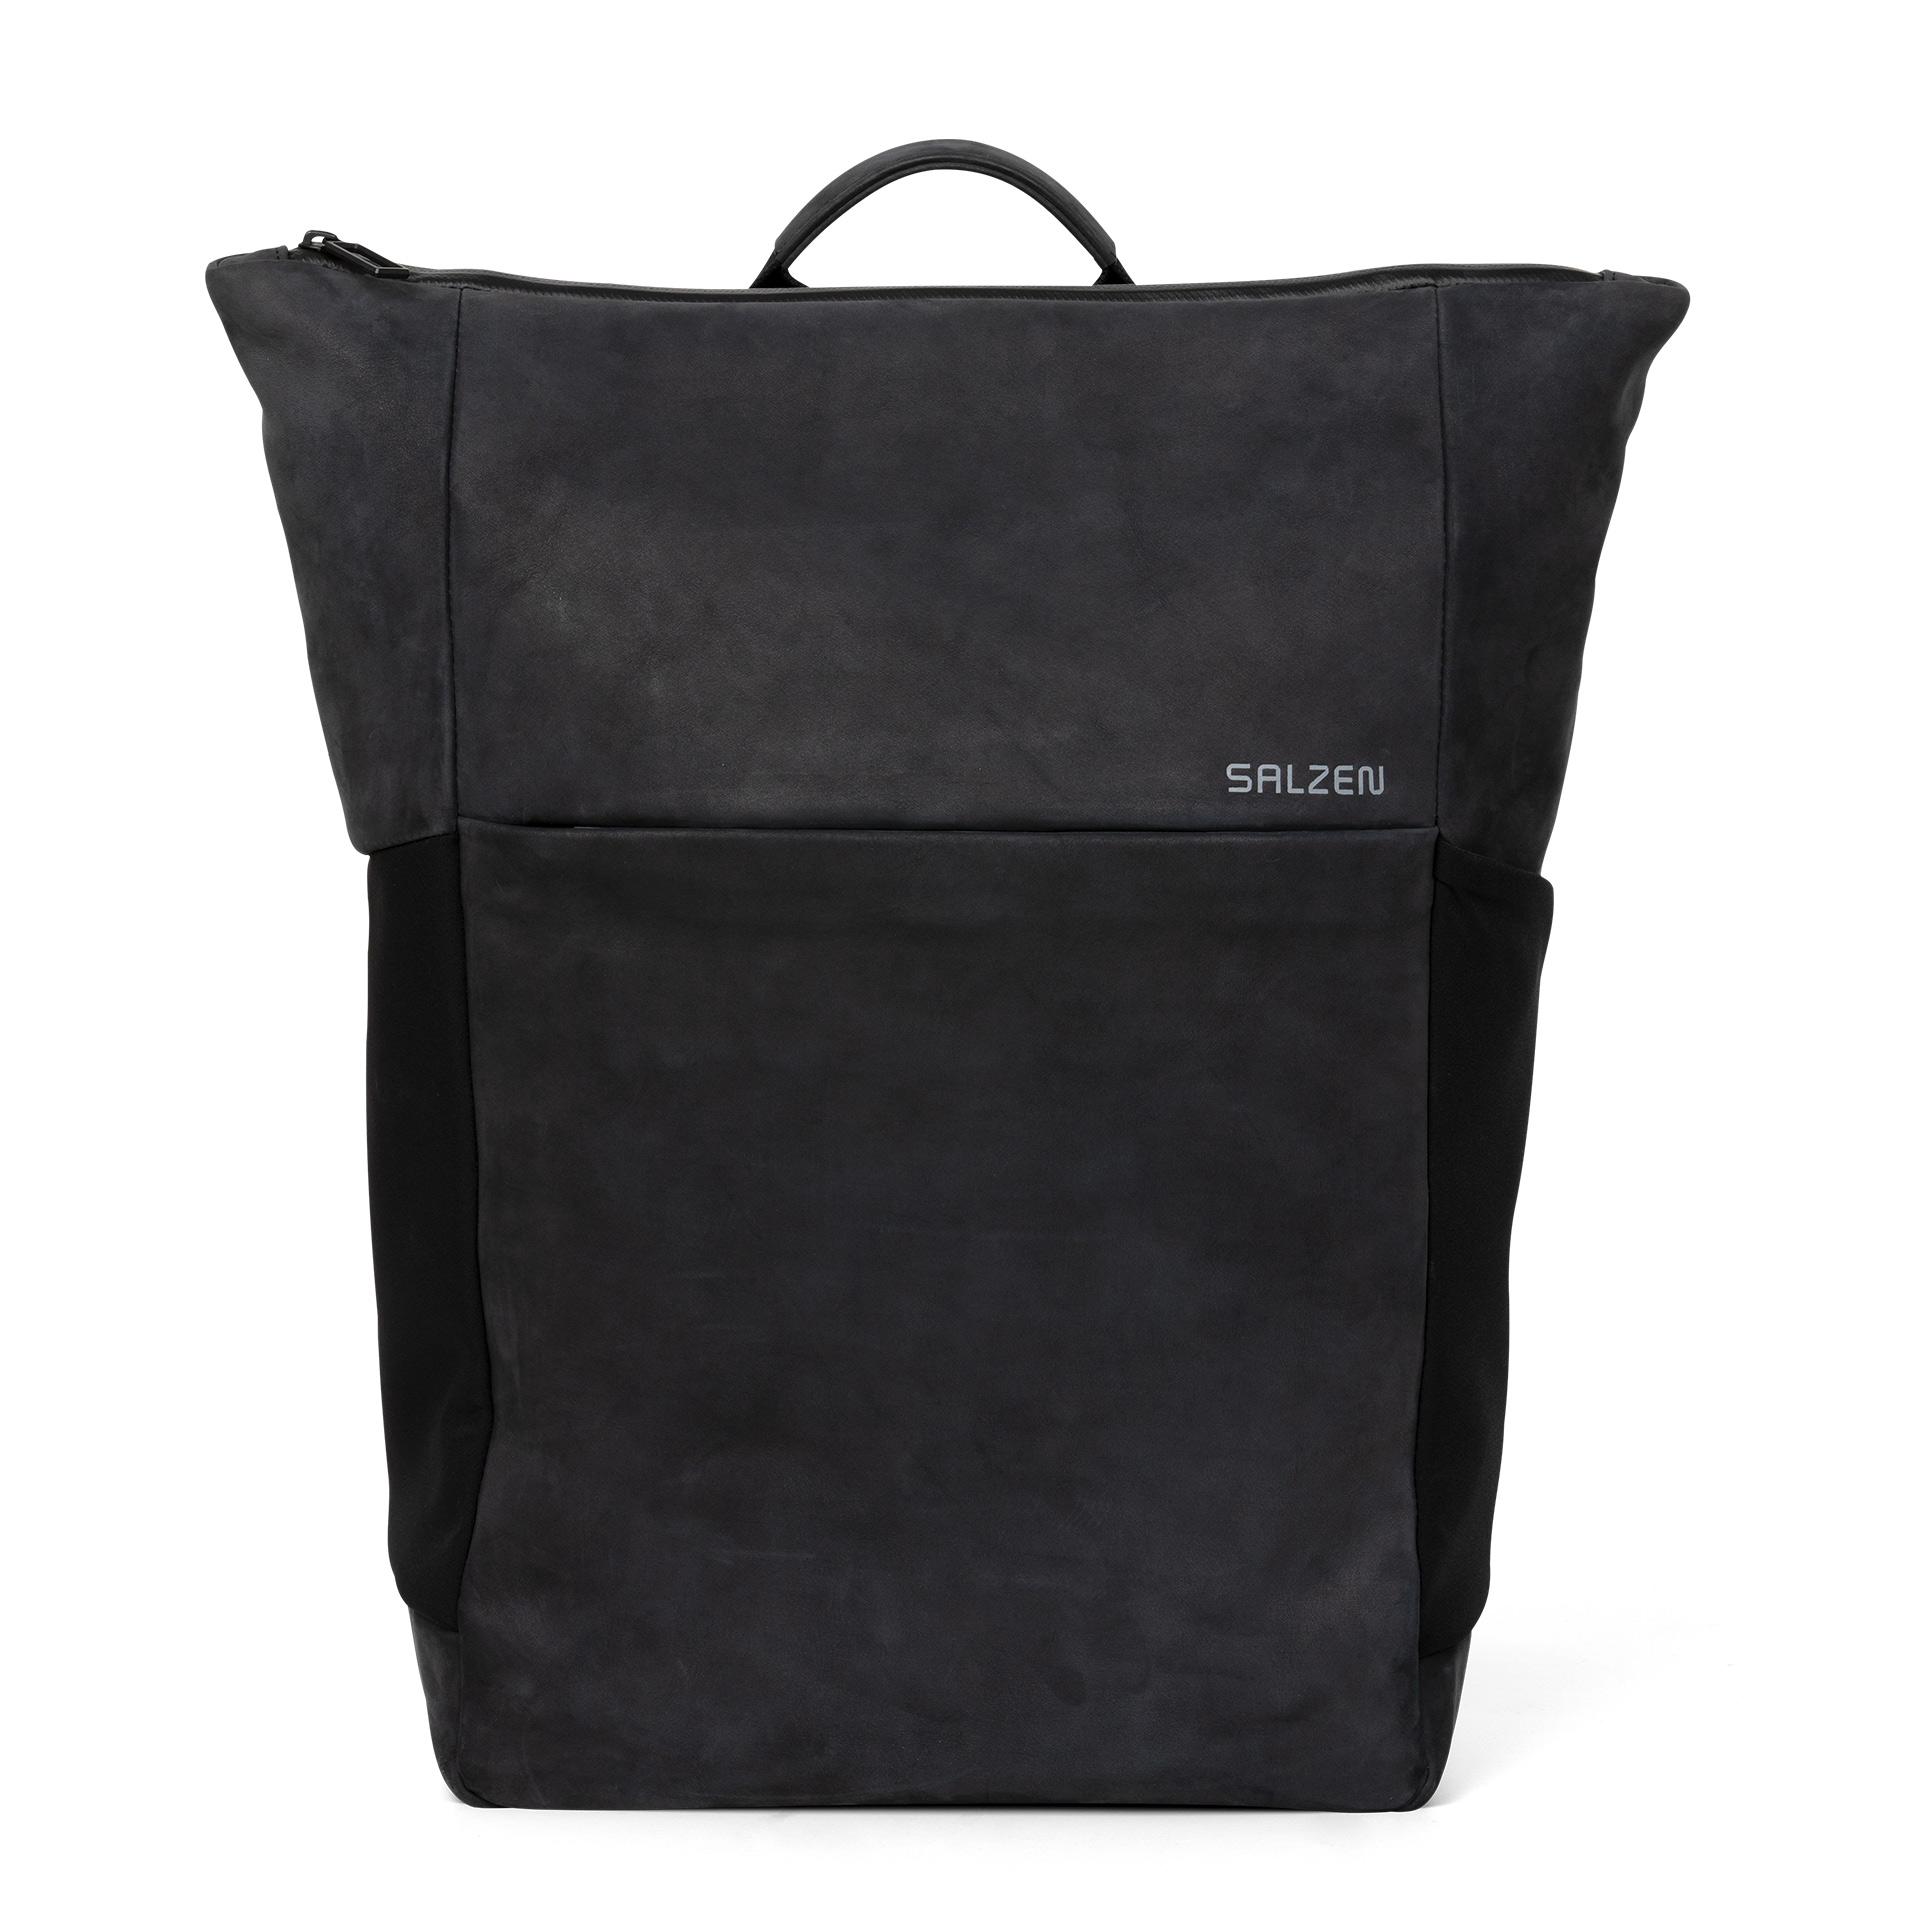 Vertiplorer Leather Plain Backpack charcoal black